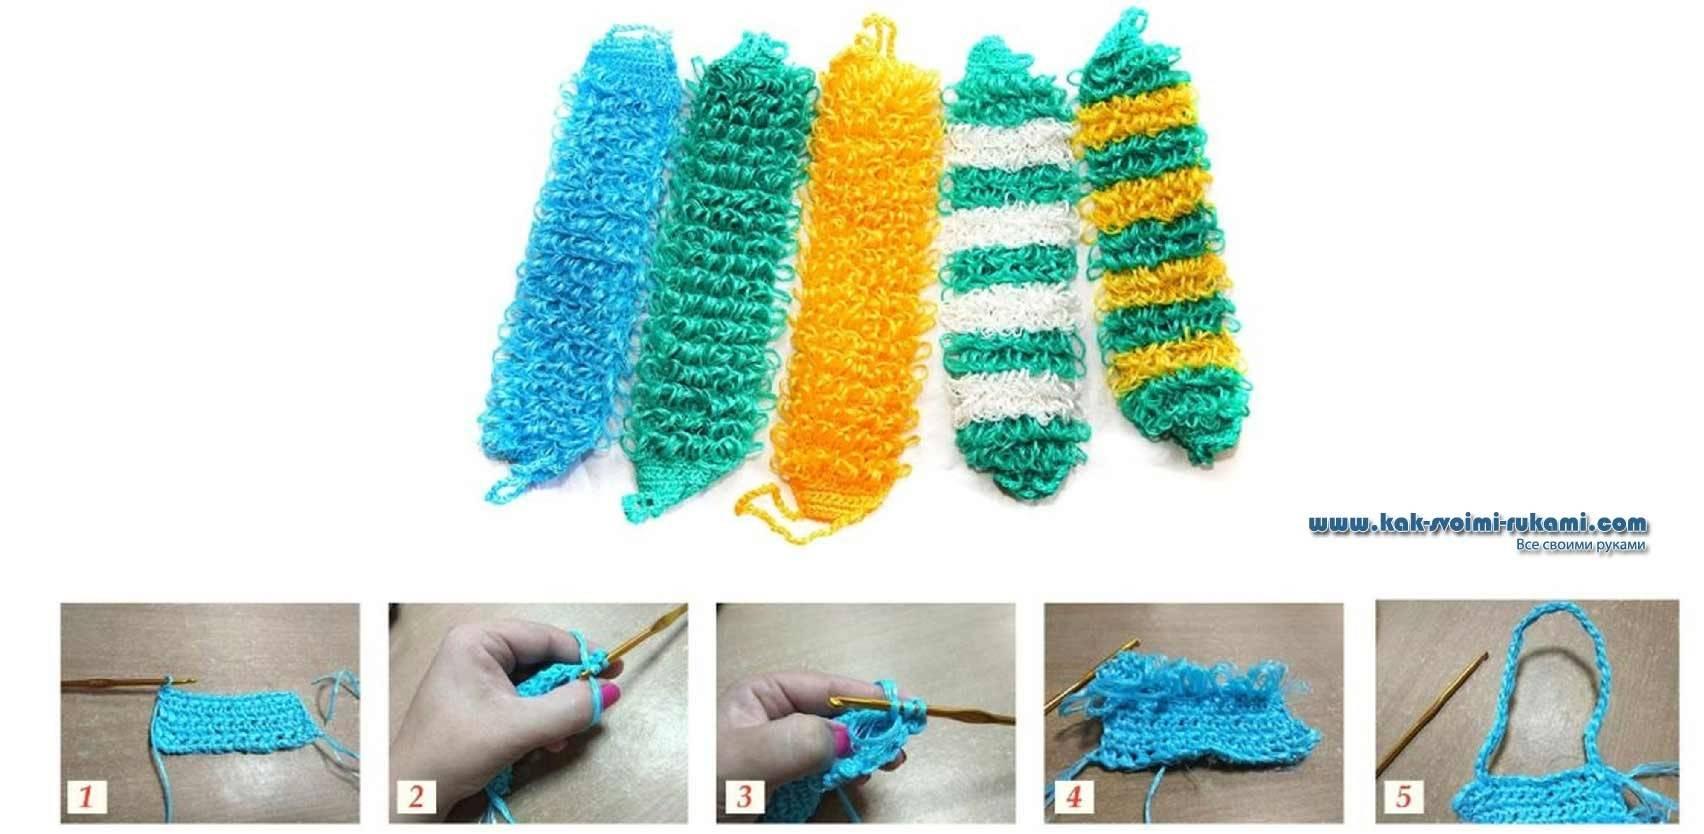 Вязание мочалки для бани своими руками